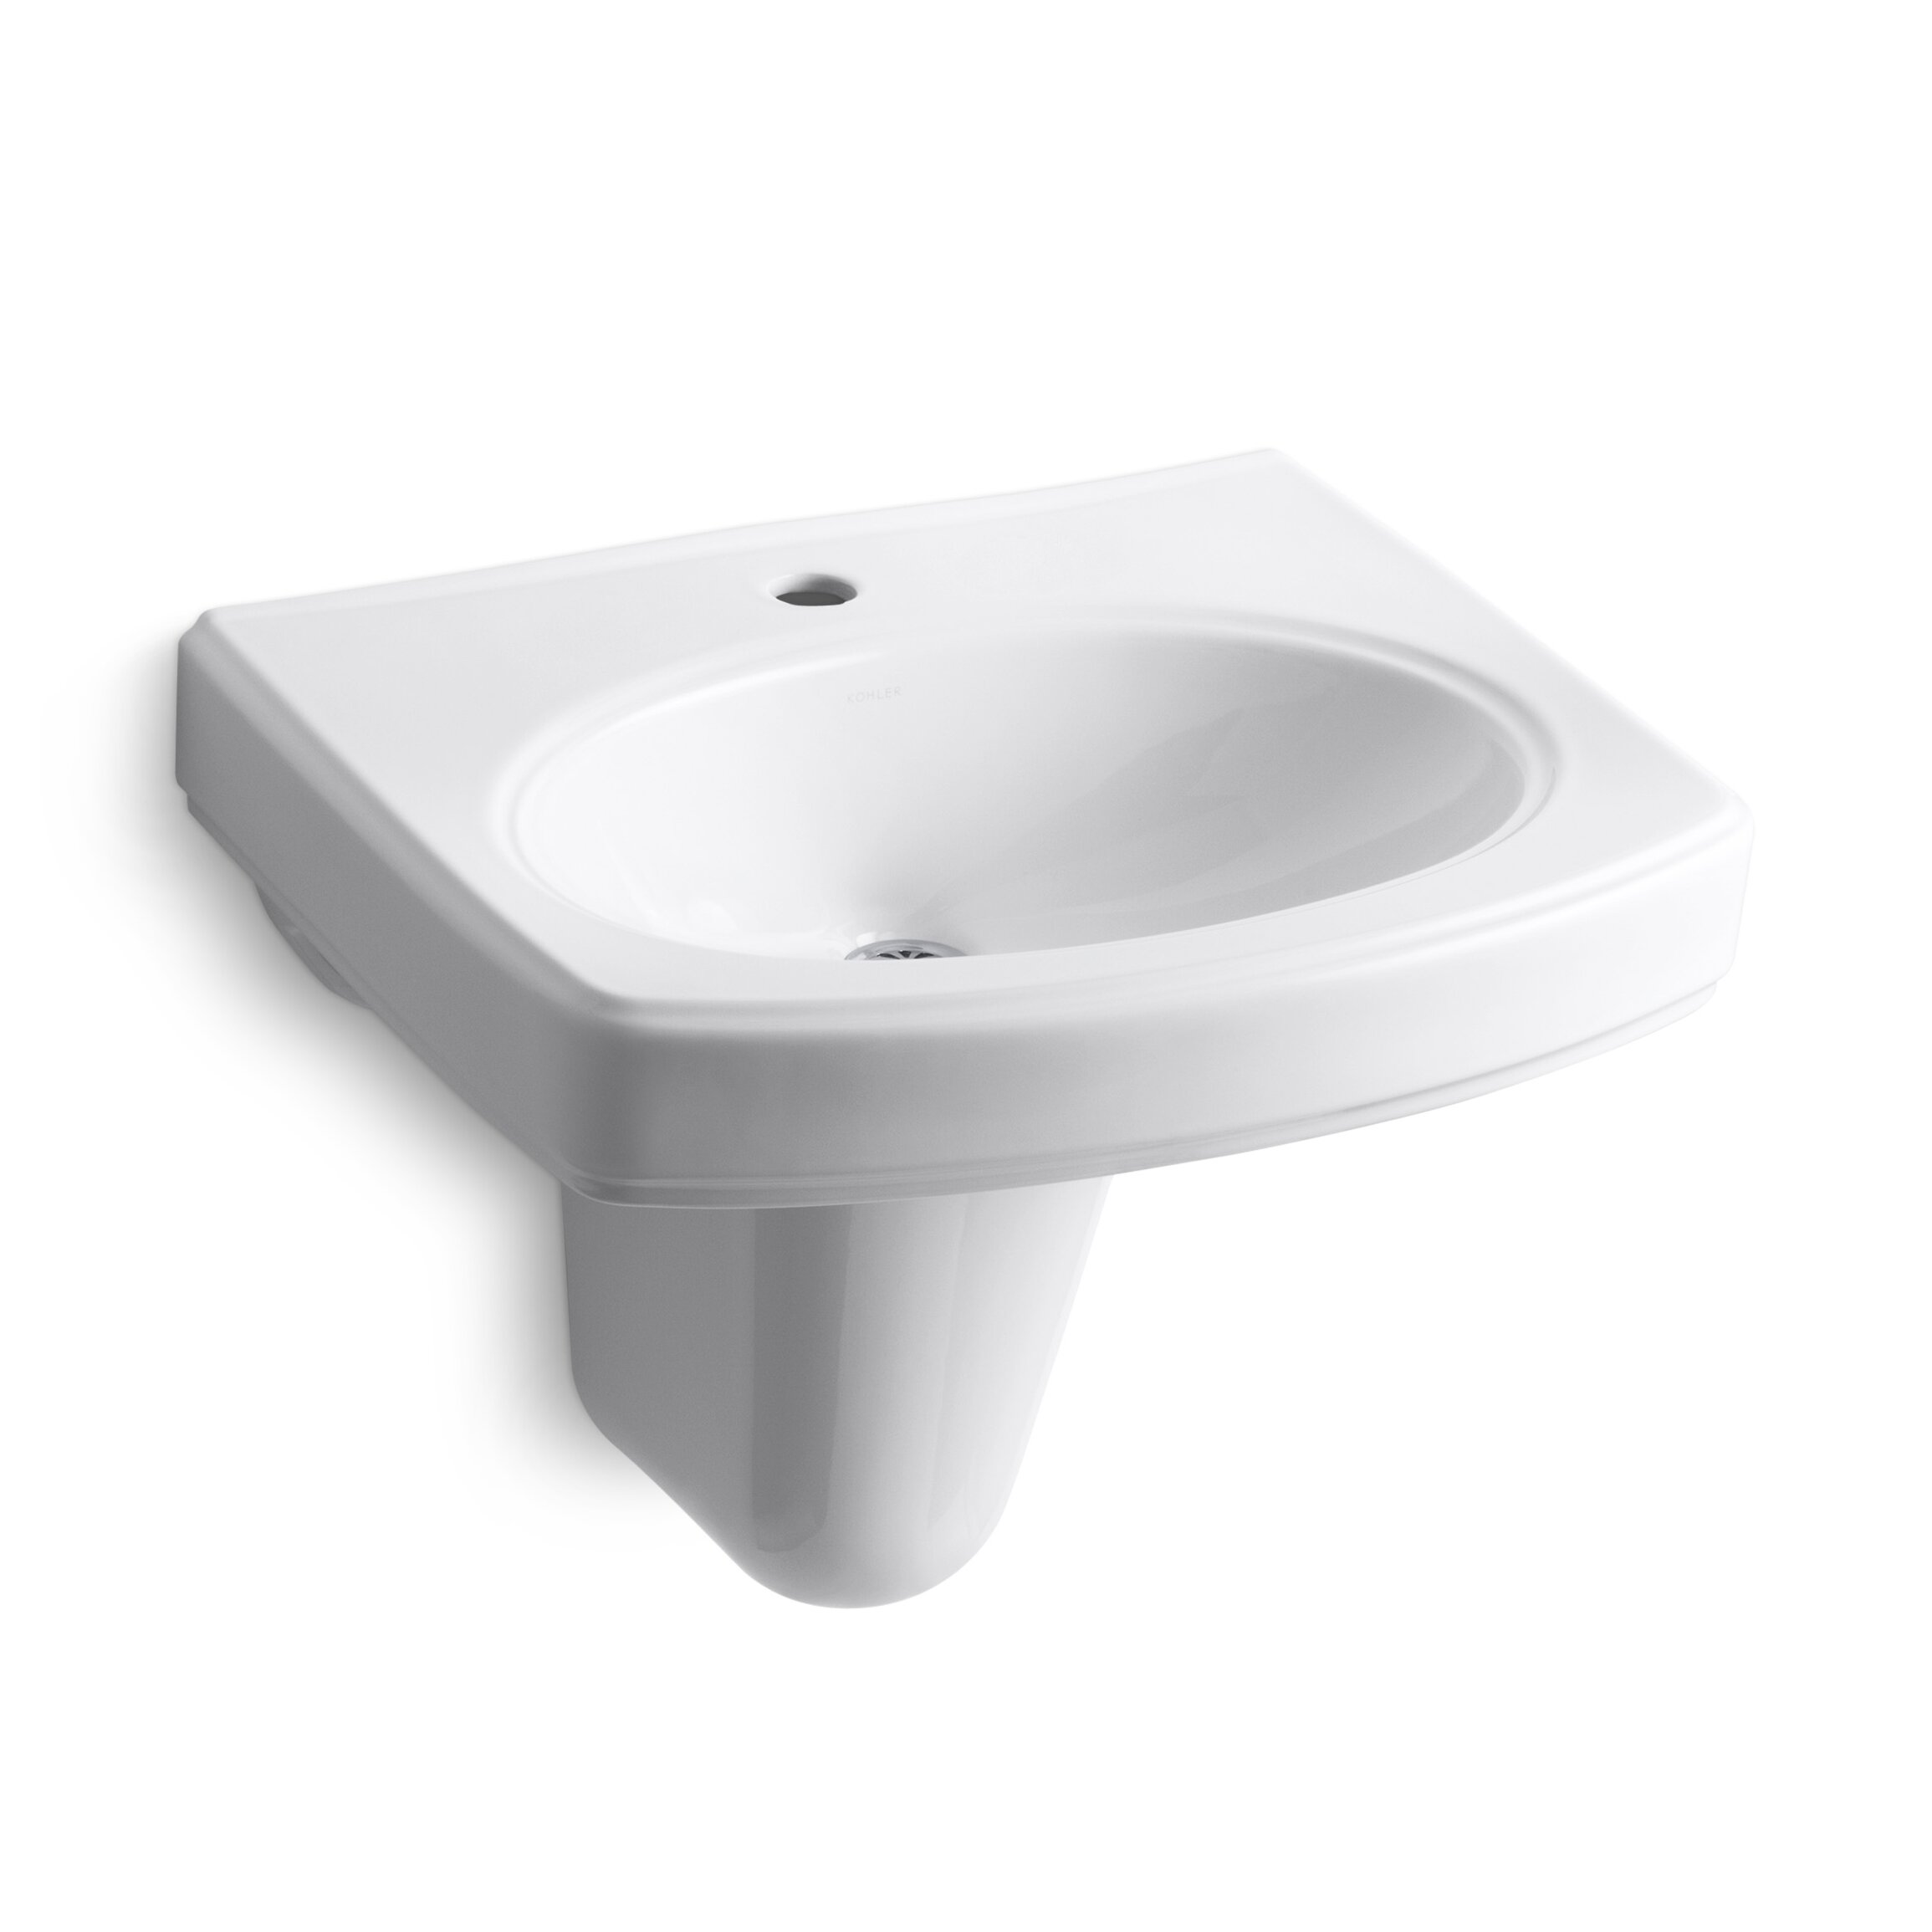 Kohler pinoir wall mount bathroom sink with single faucet - Kohler wall mount bathroom sink faucet ...